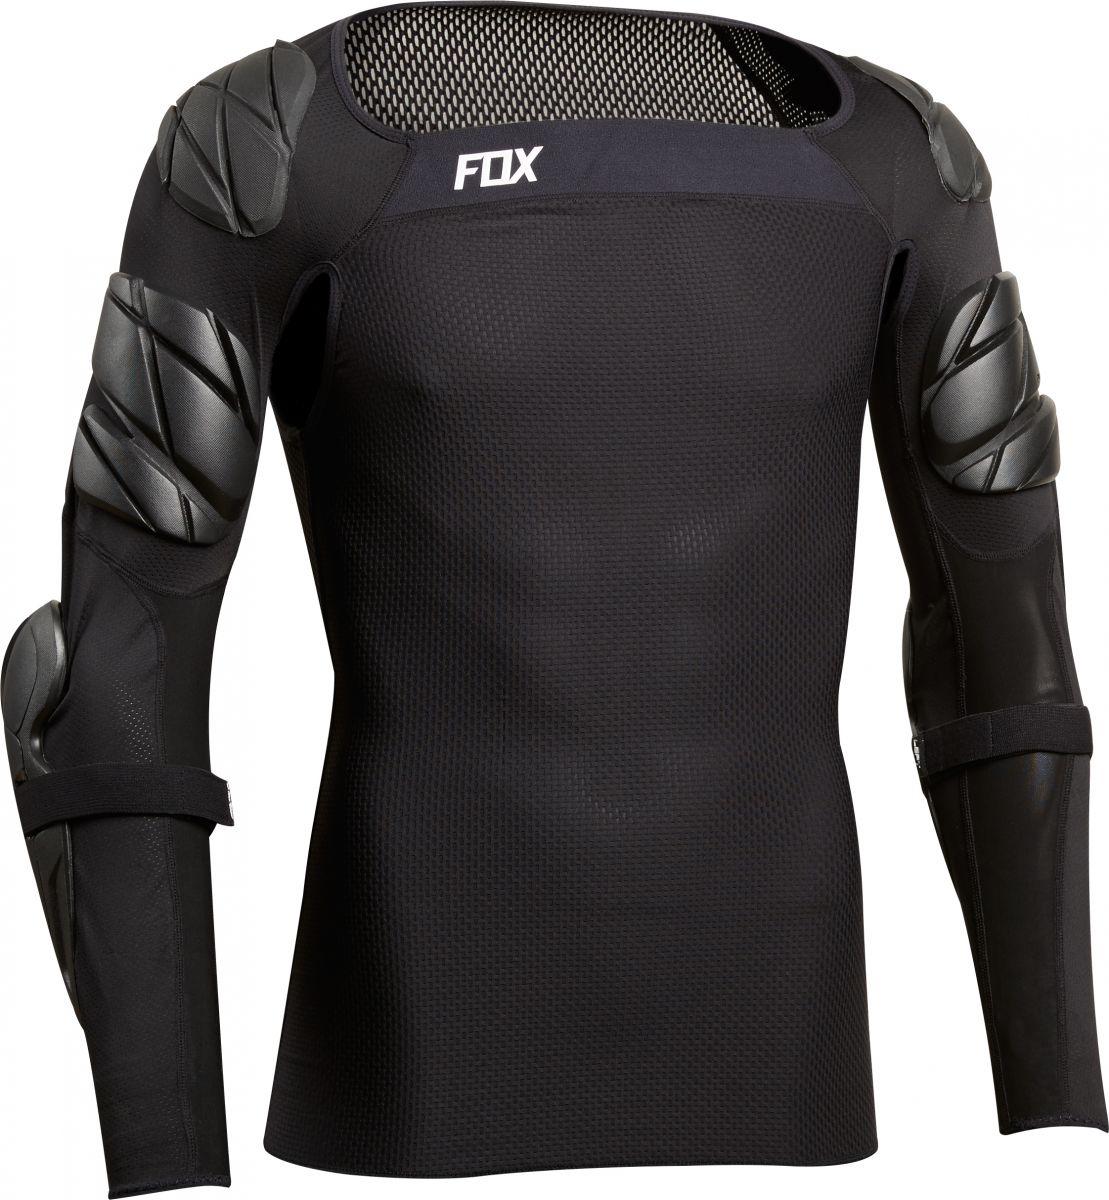 Fox - Airframe Pro Sleeve CE Black защитное джерси, черный